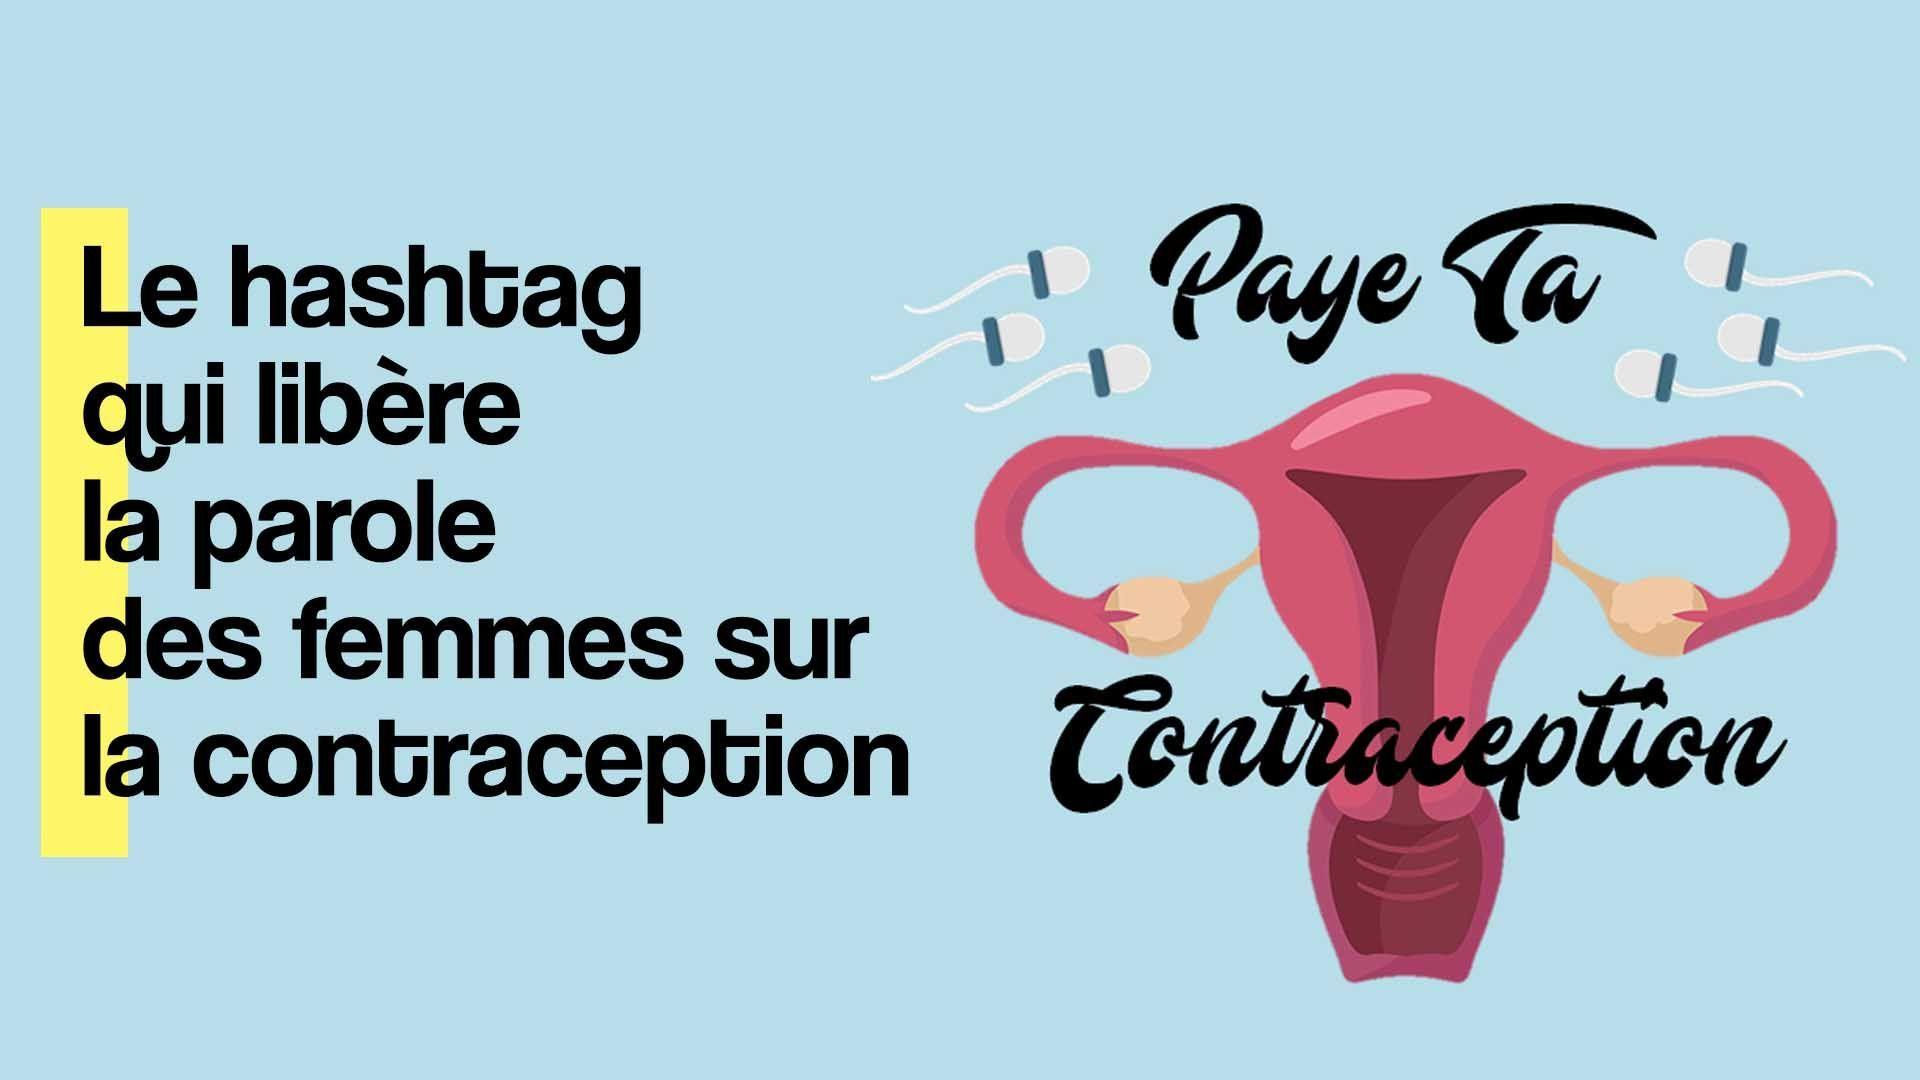 Payetacontraception hashtag sabrina debusquat pilule